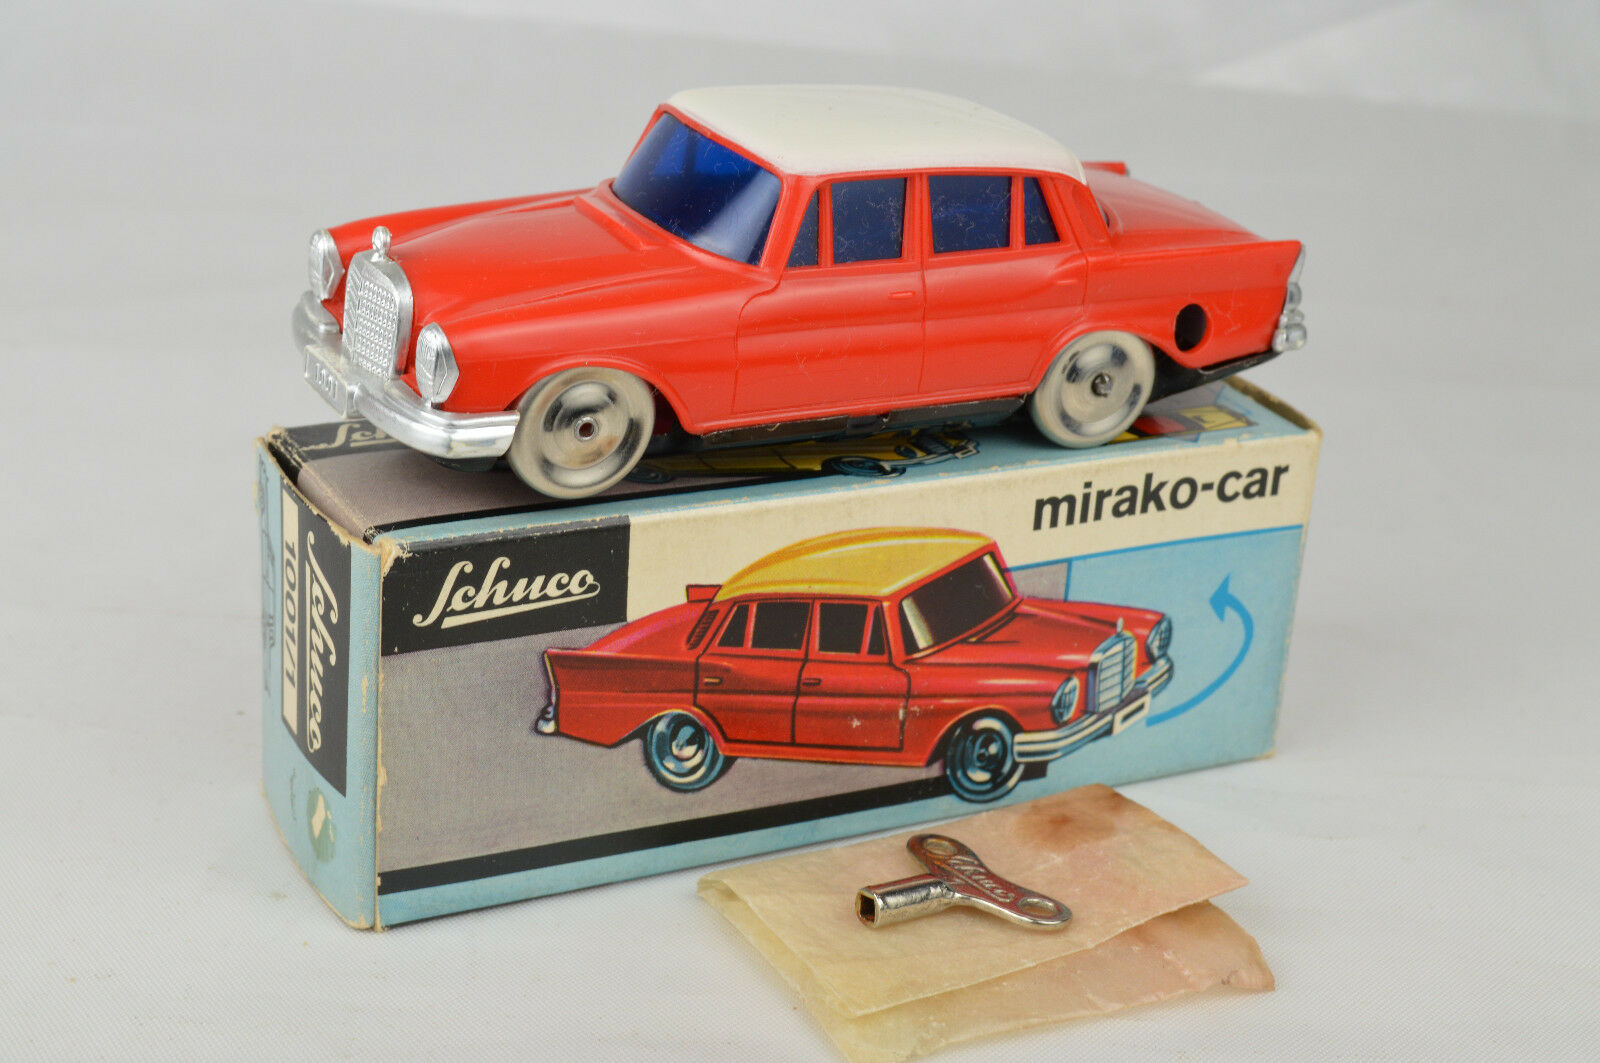 Vintage Schuco  1 Mercedes mirako Auto 4 34 de largo Alemania Occidental Nm wbox